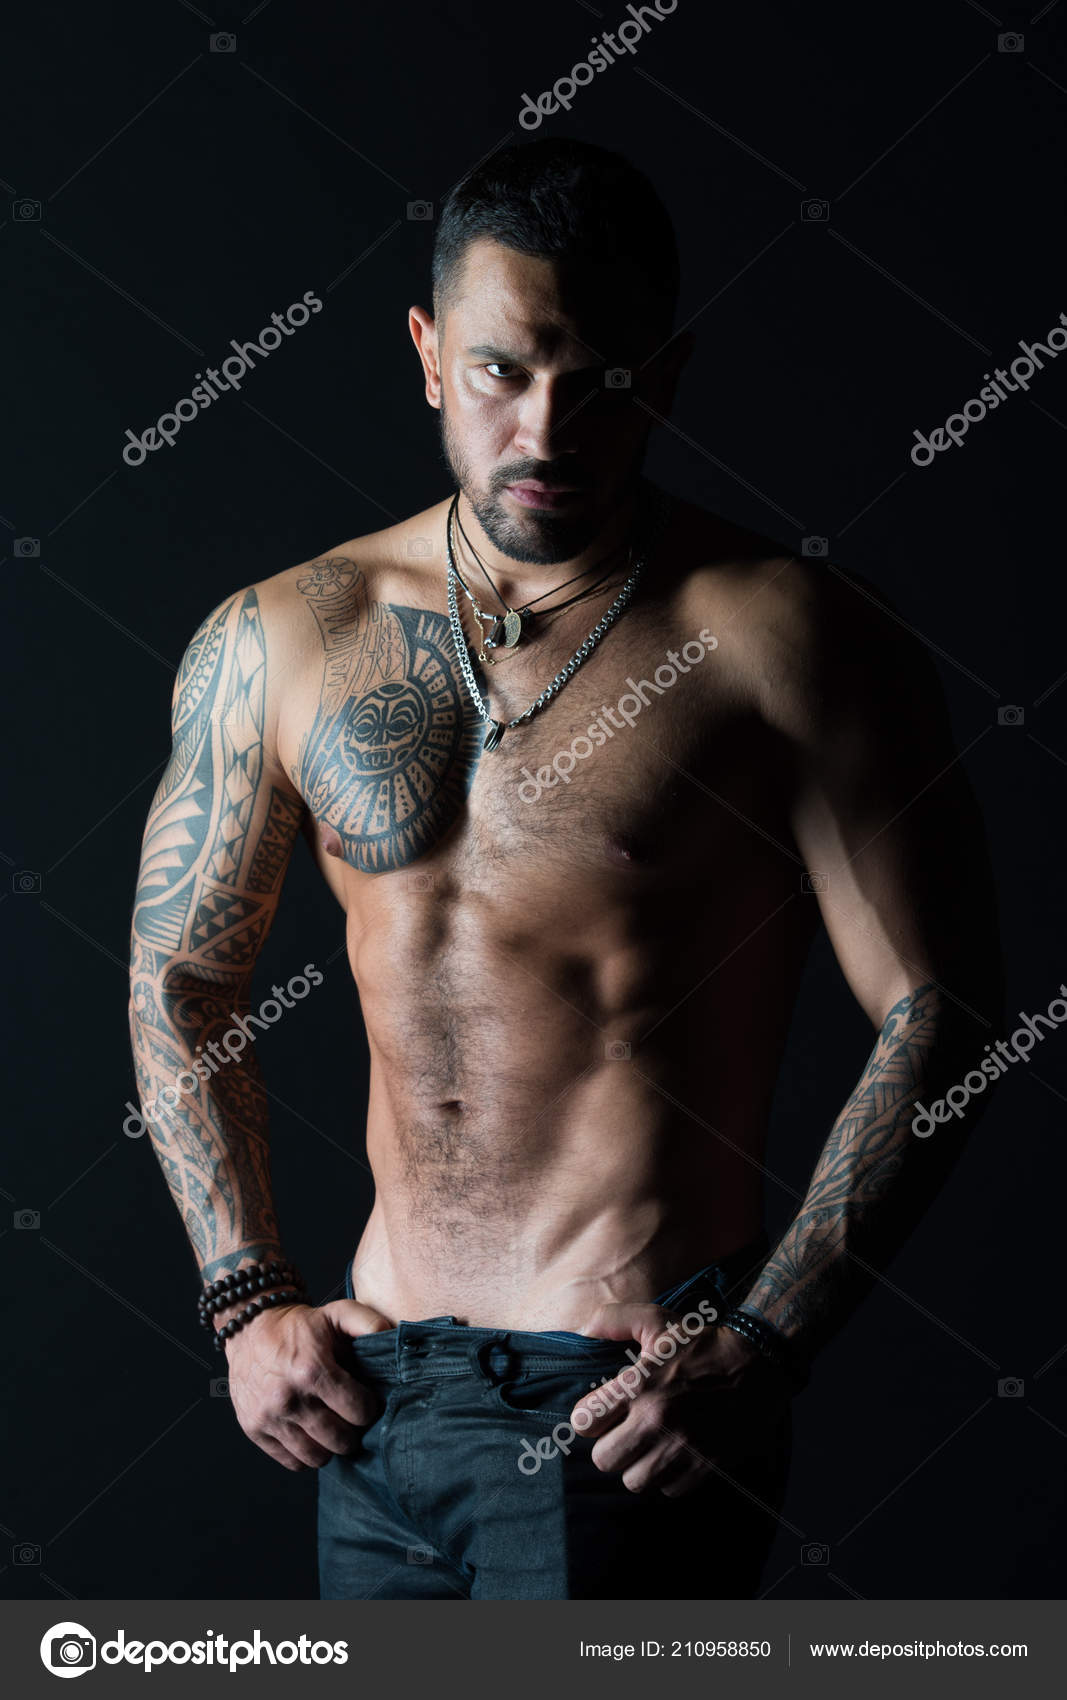 Male stripper rapidshare